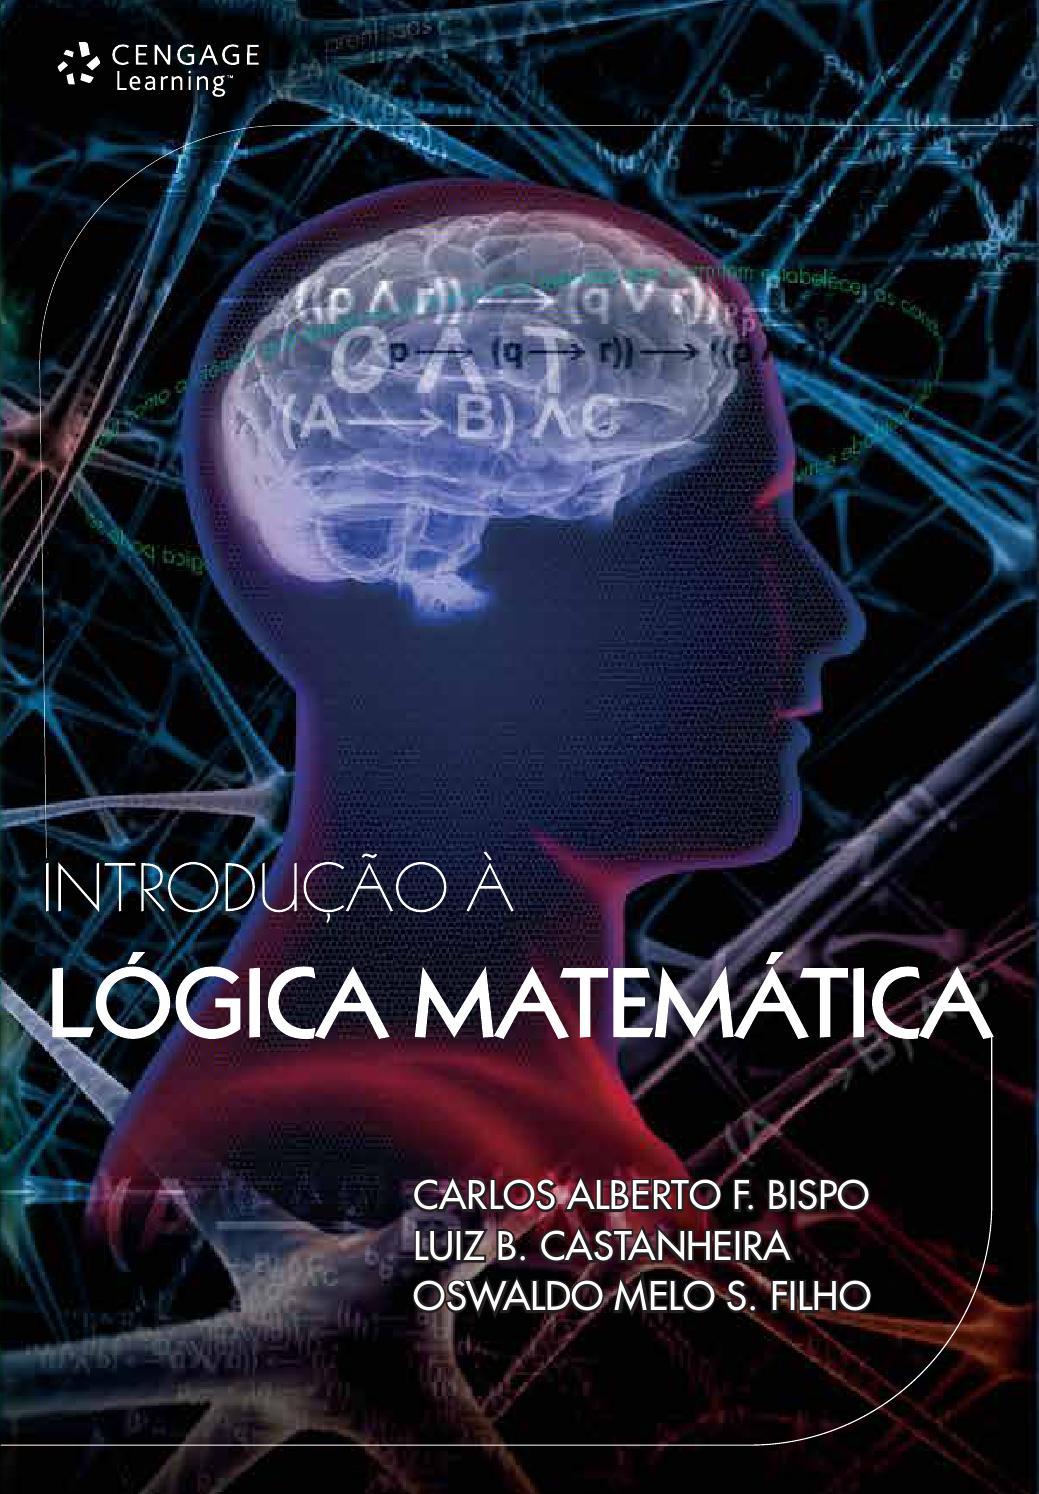 Introdução à Lógica Matemática by Cengage Brasil - Issuu